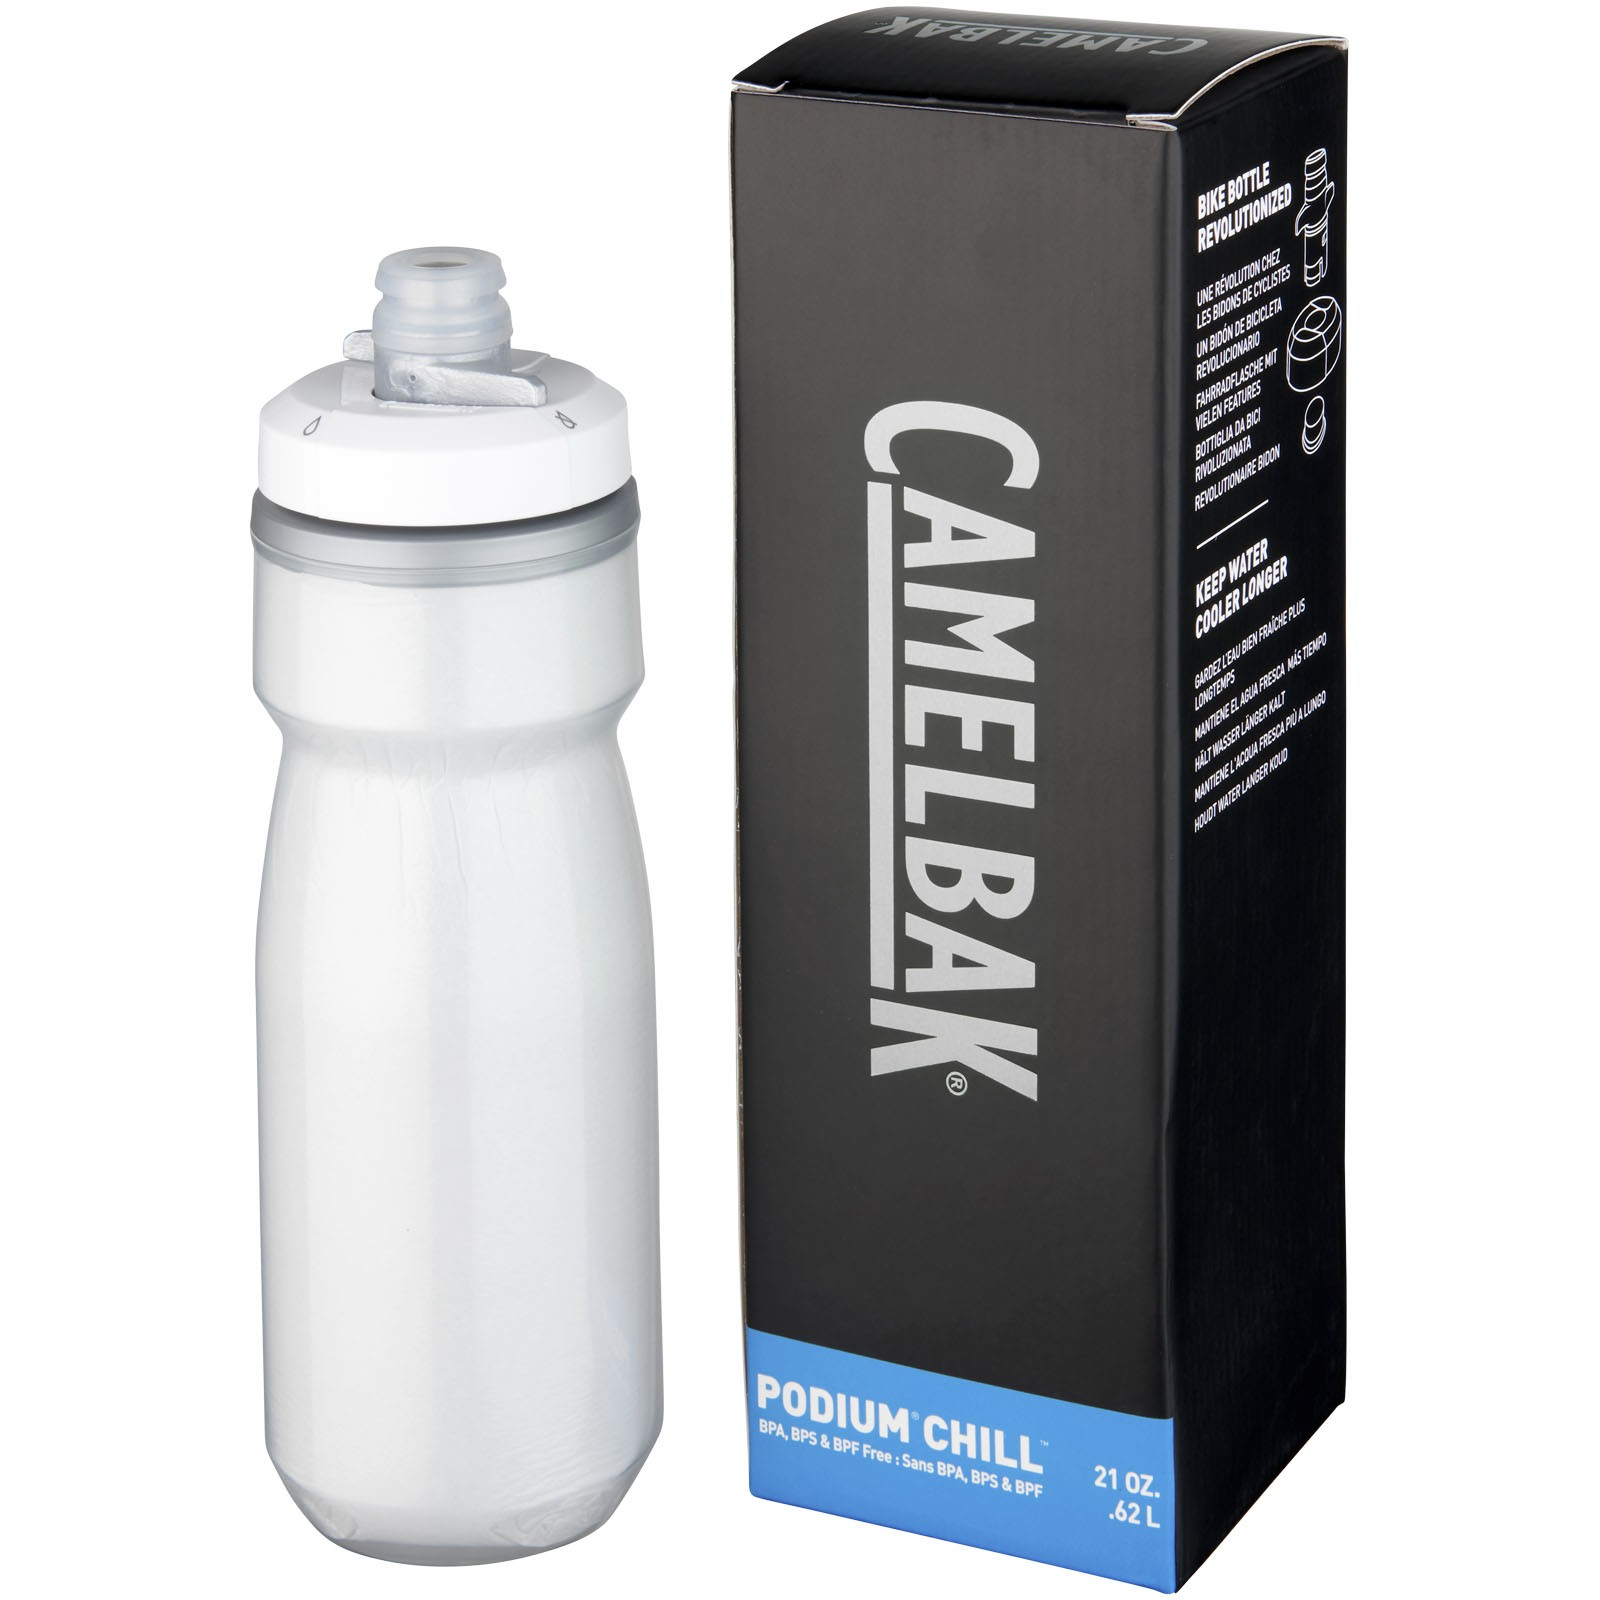 Podium Chill 620 ml sport bottle - White